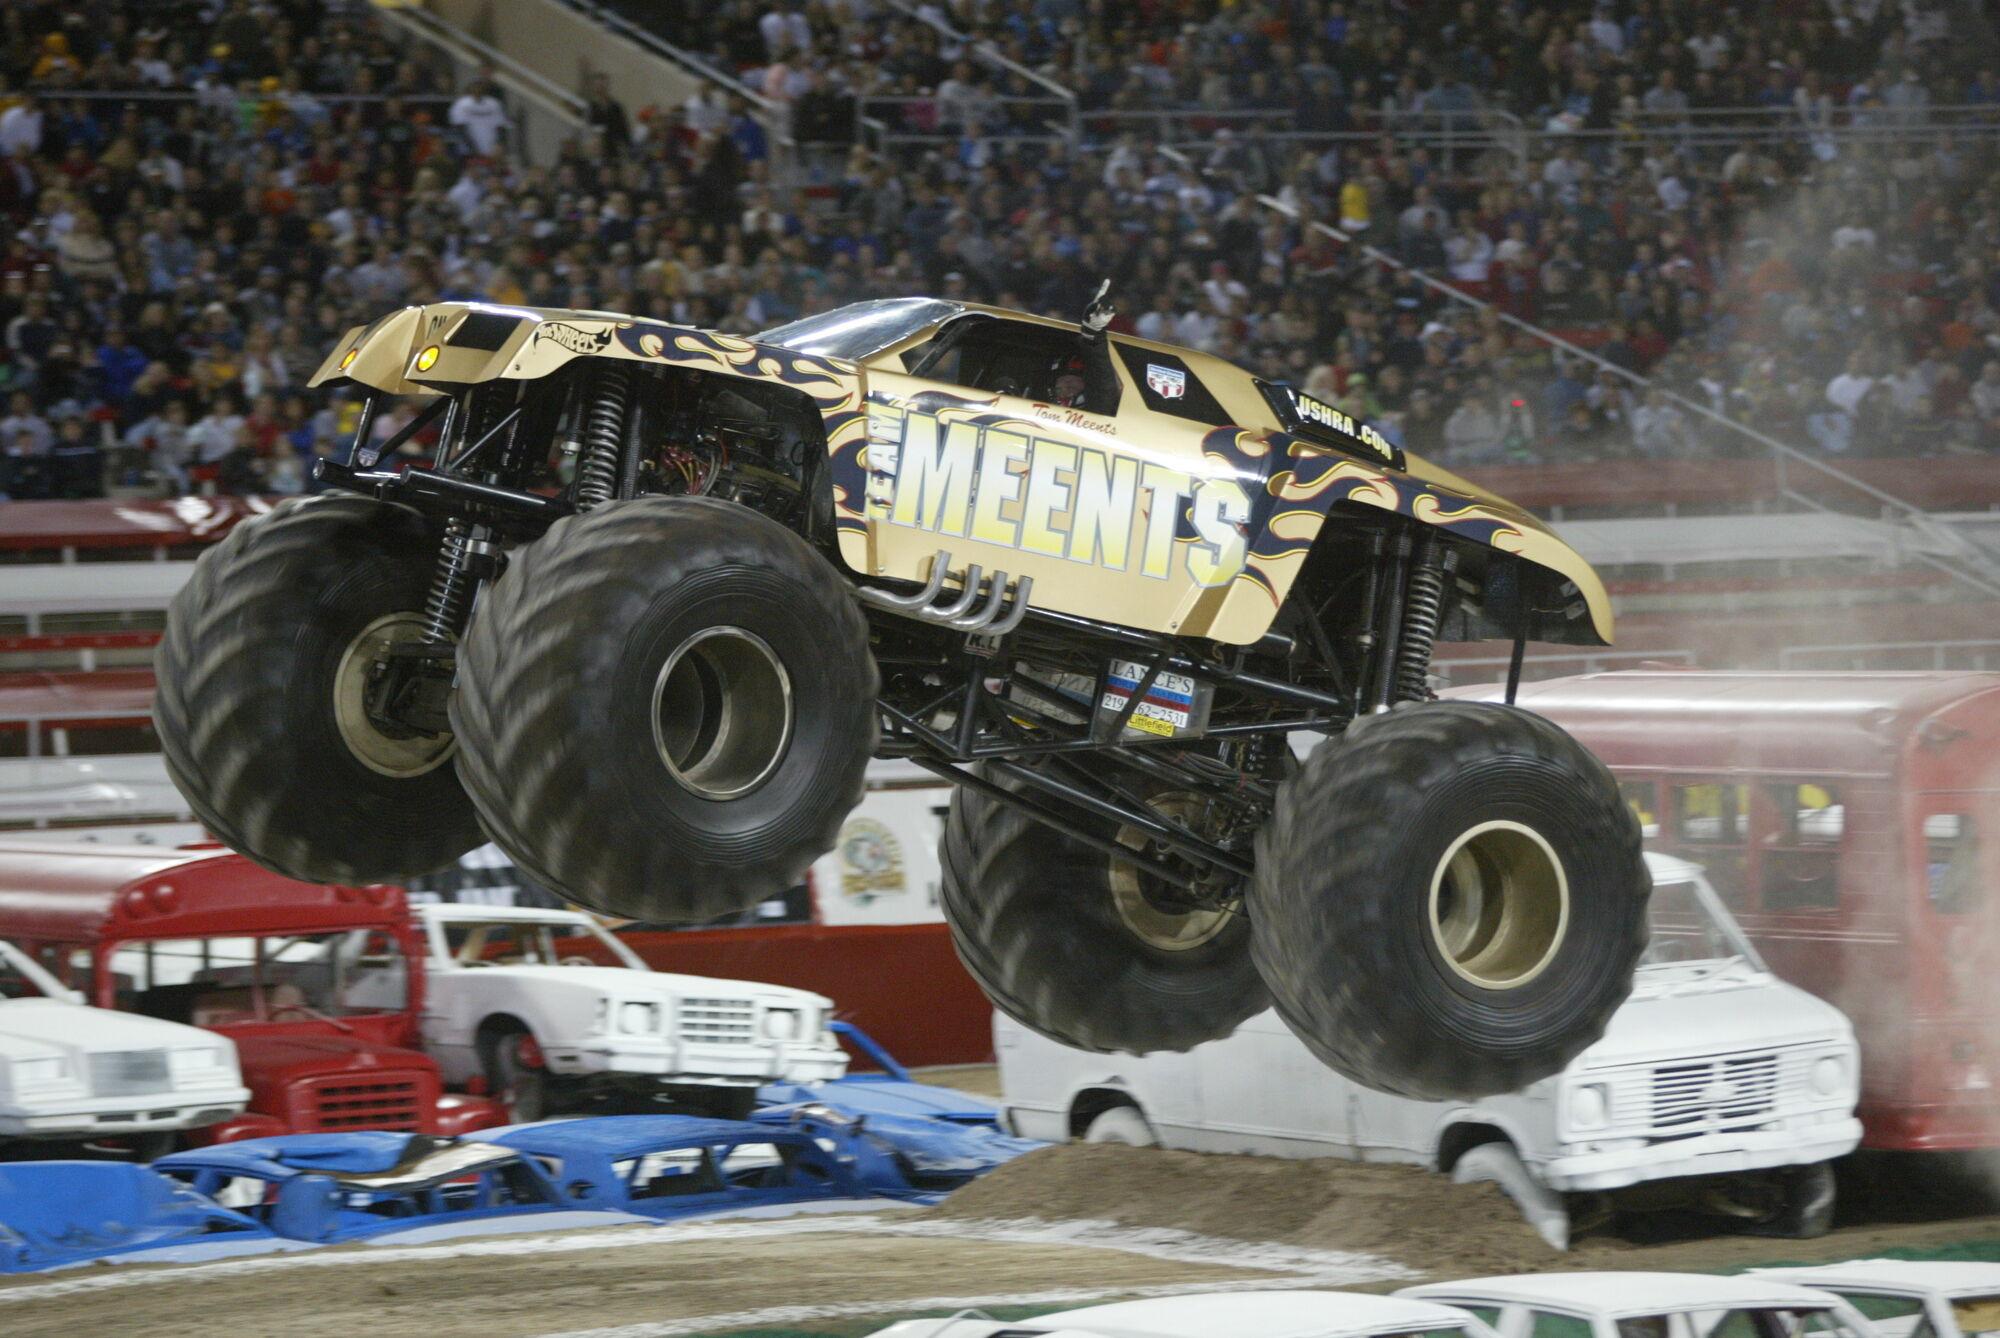 Team Meents | Monster Trucks Wiki | FANDOM powered by Wikia